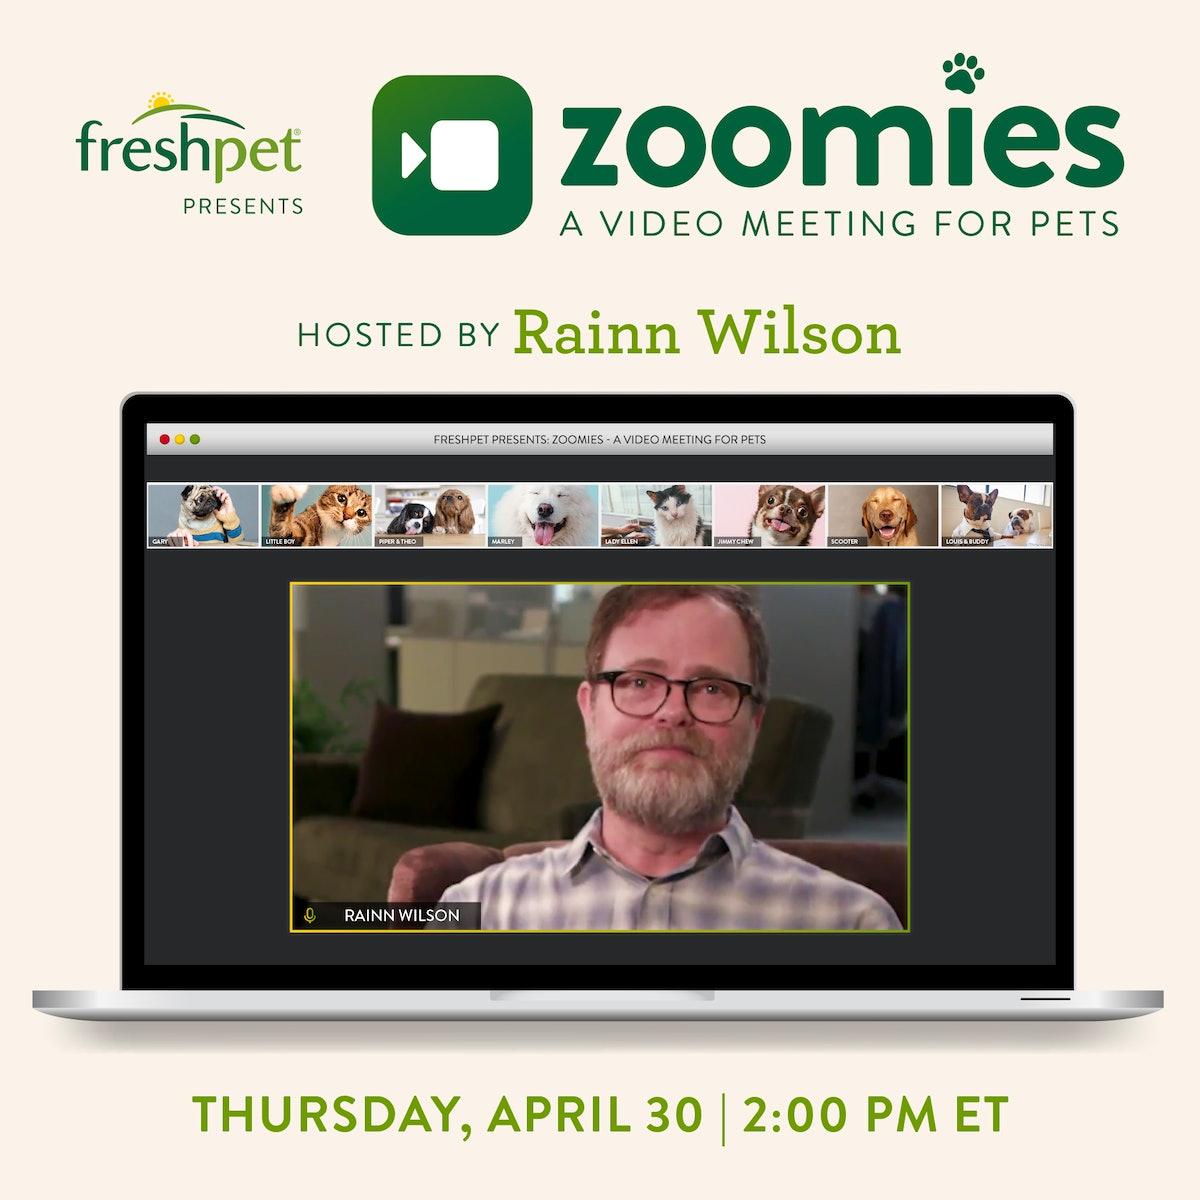 You can join Rainn Wilson on an all-pet Zoom meeting.